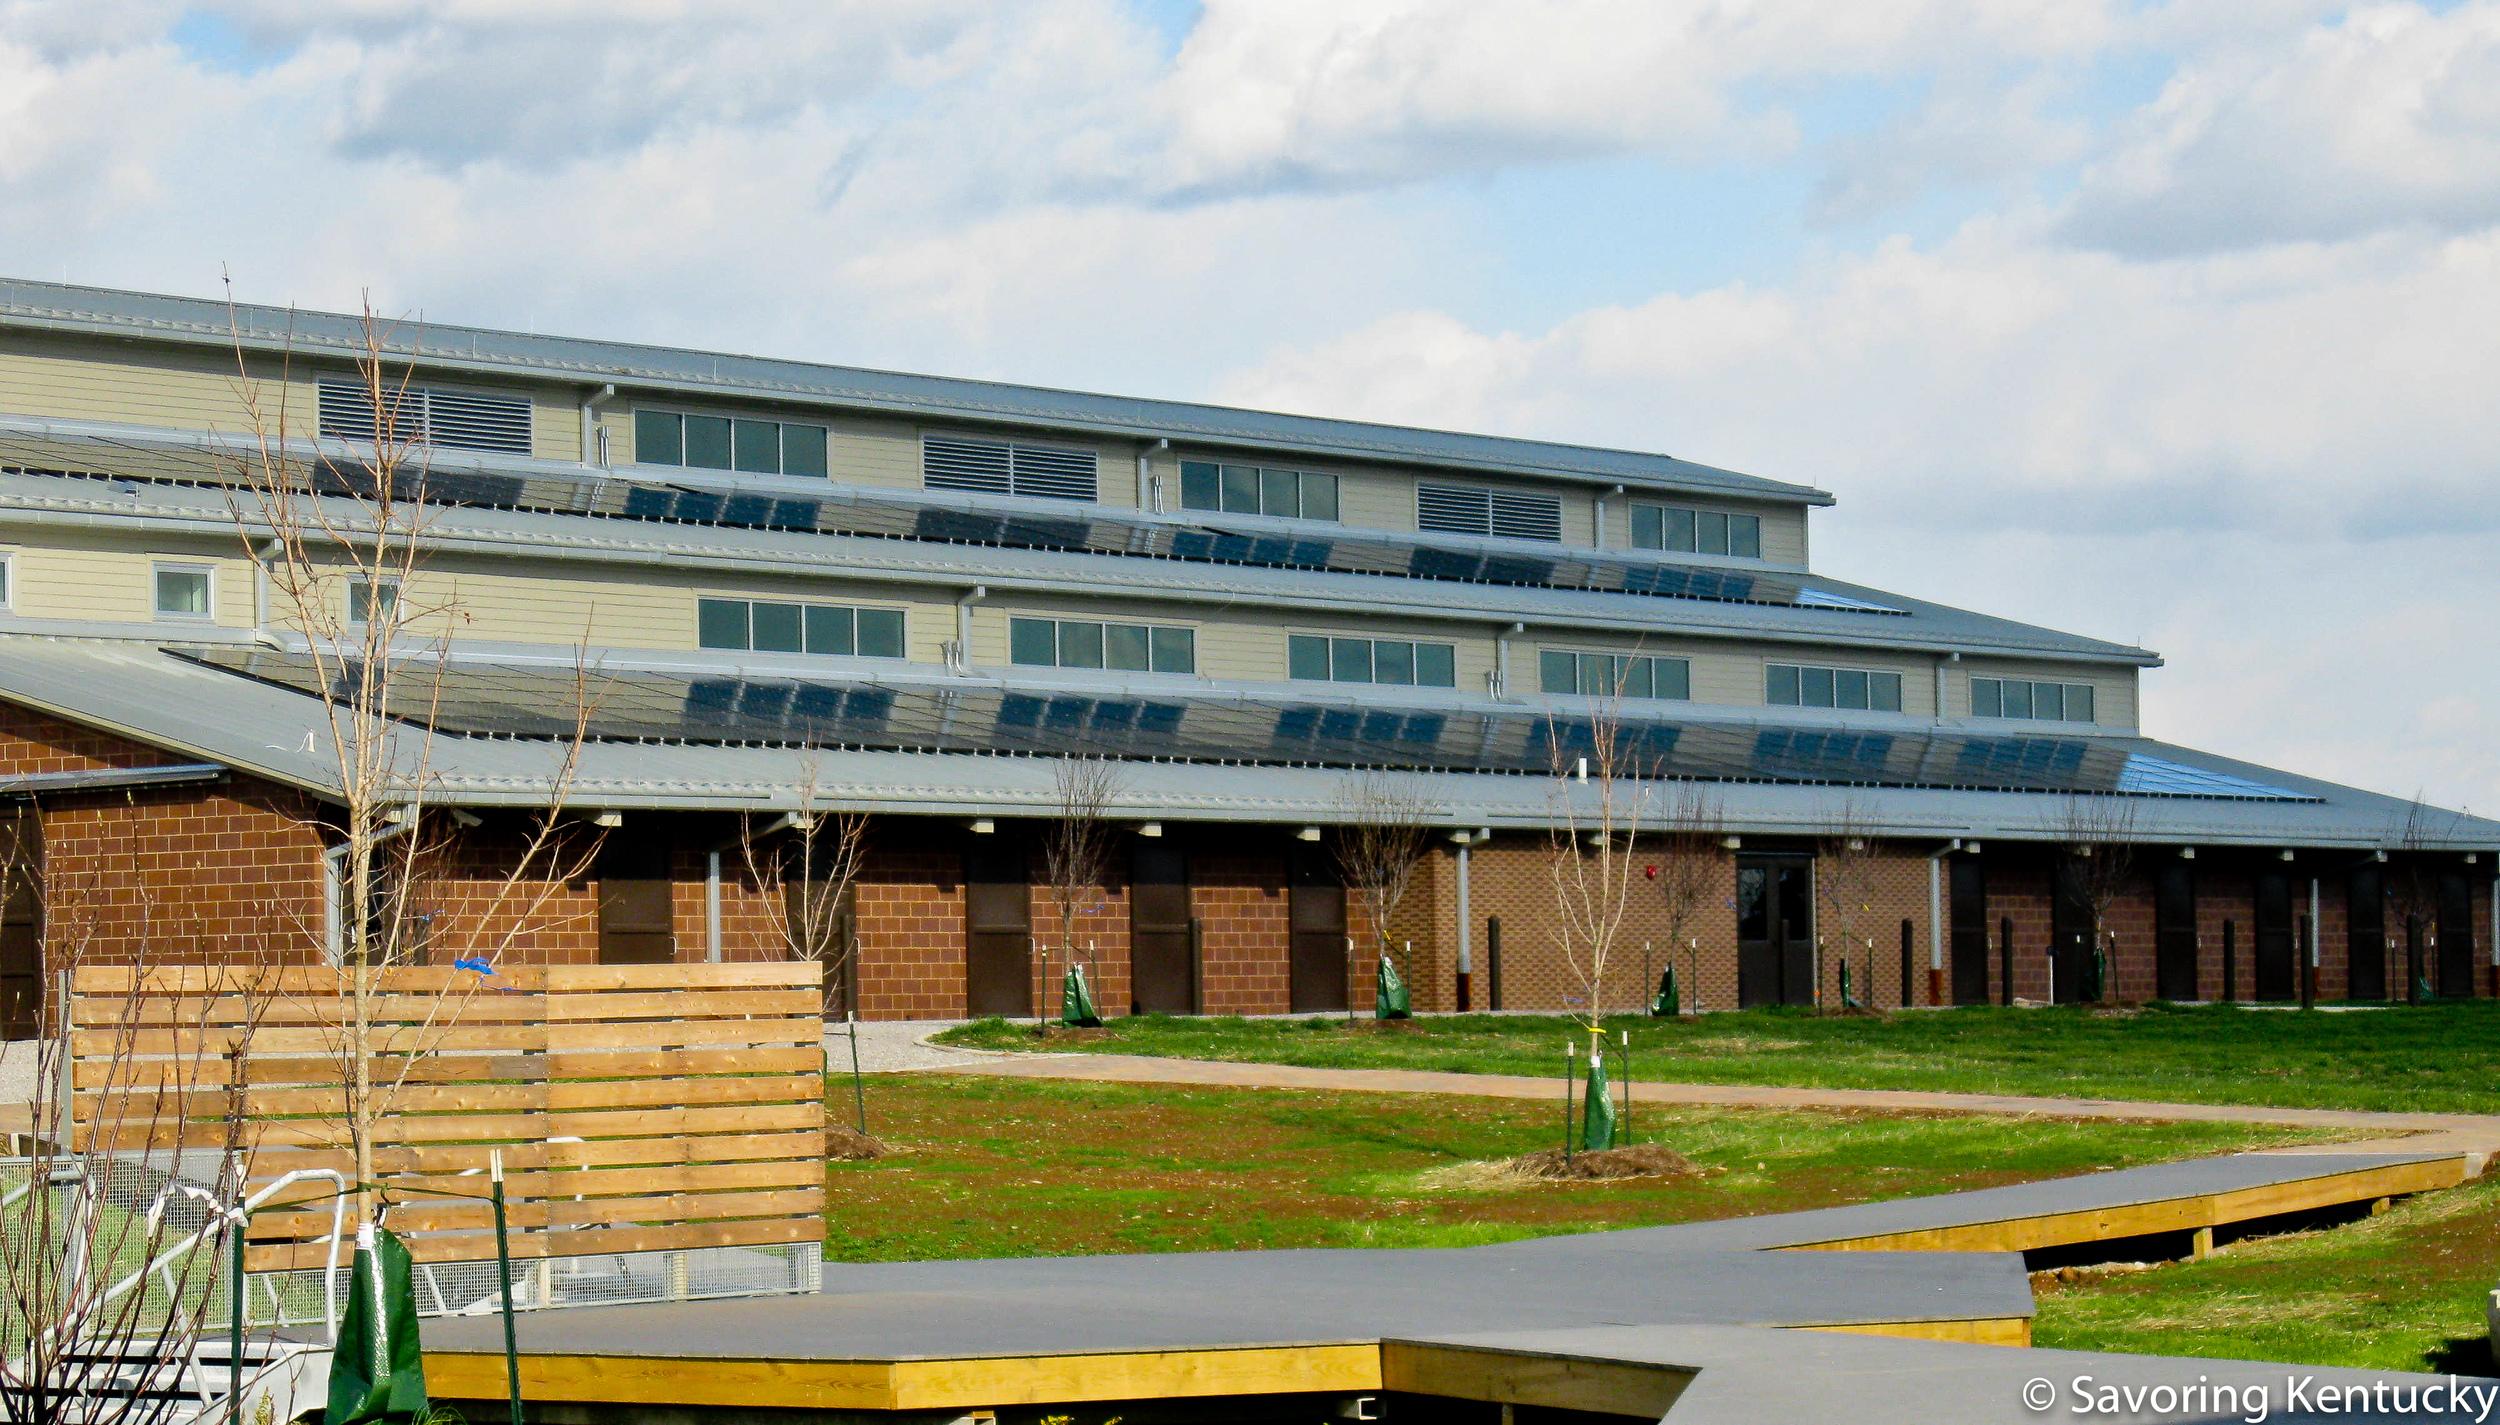 One of several net zero buildings at Locust Trace Agriscience Farm, Lexington, Kentucky